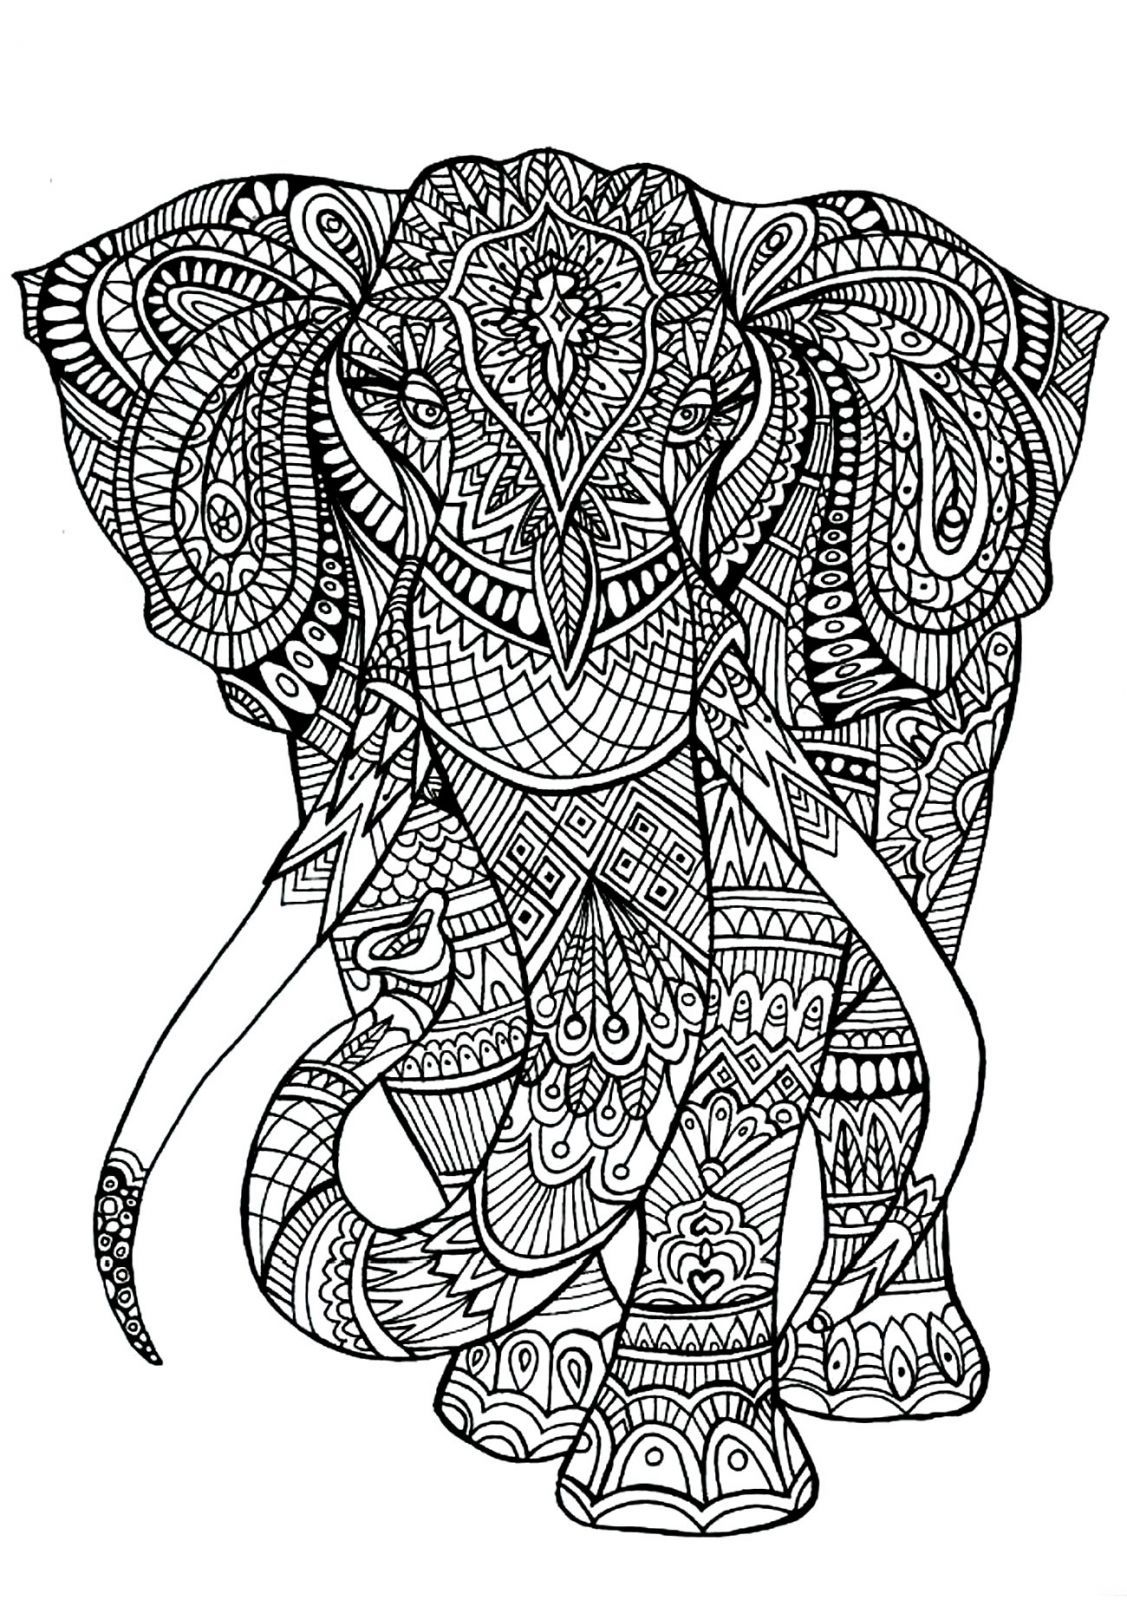 Coloriage Mandala A Imprimer Animaux Elephant En 2020 Coloriage Mandala Coloriage Elephant Coloriage